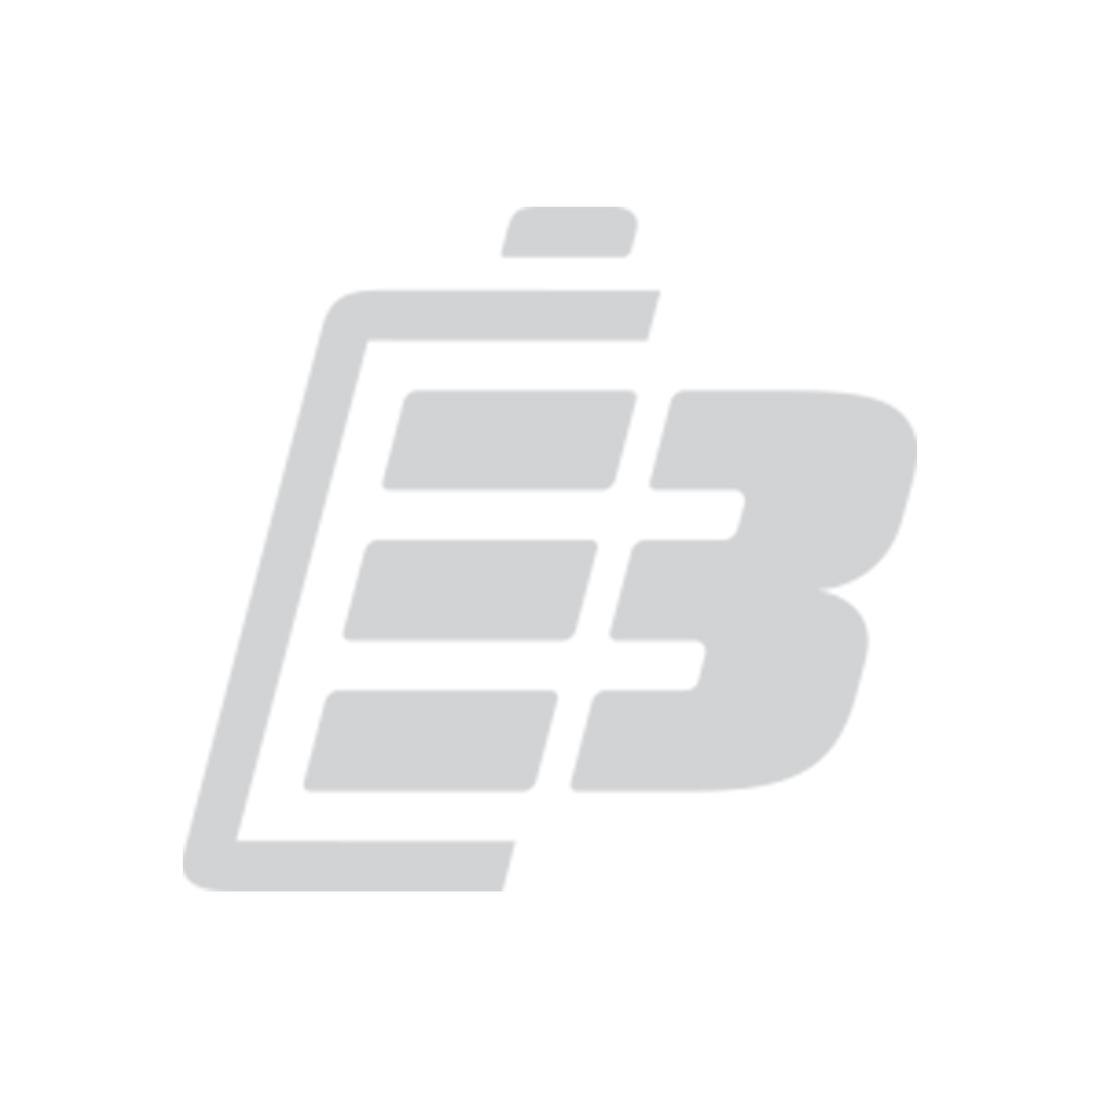 Two-Way radio battery Cobra FRS120_1